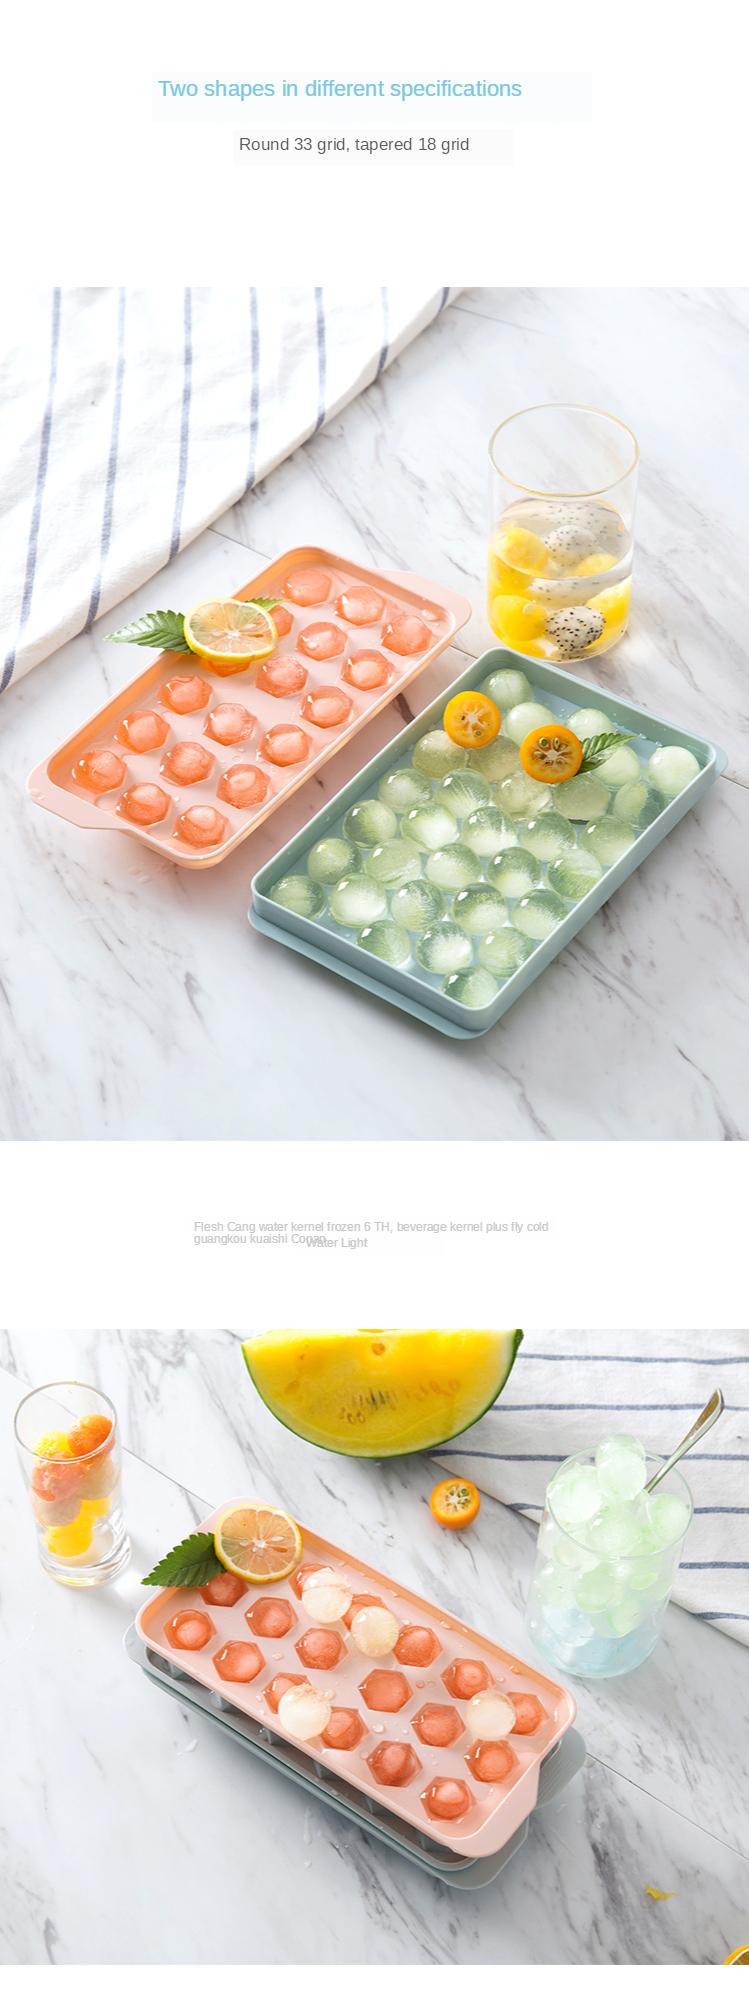 Homemade ice hockey frozen ice cube mold refrigerator ice box spherical ice tray creative home making ice tray box ice box 4